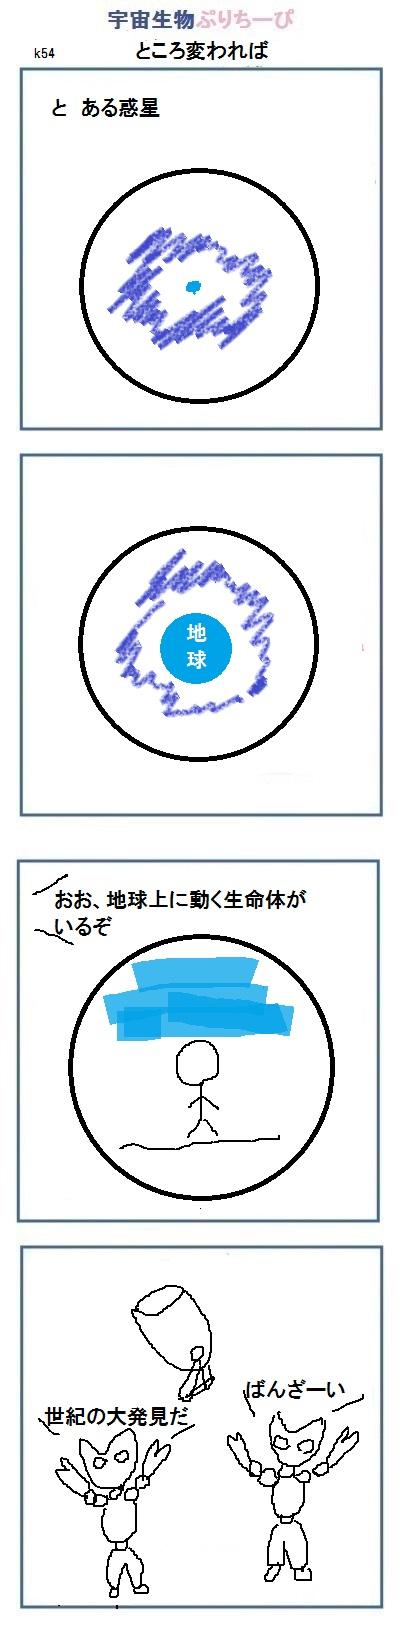 160727_kinsei54.jpg